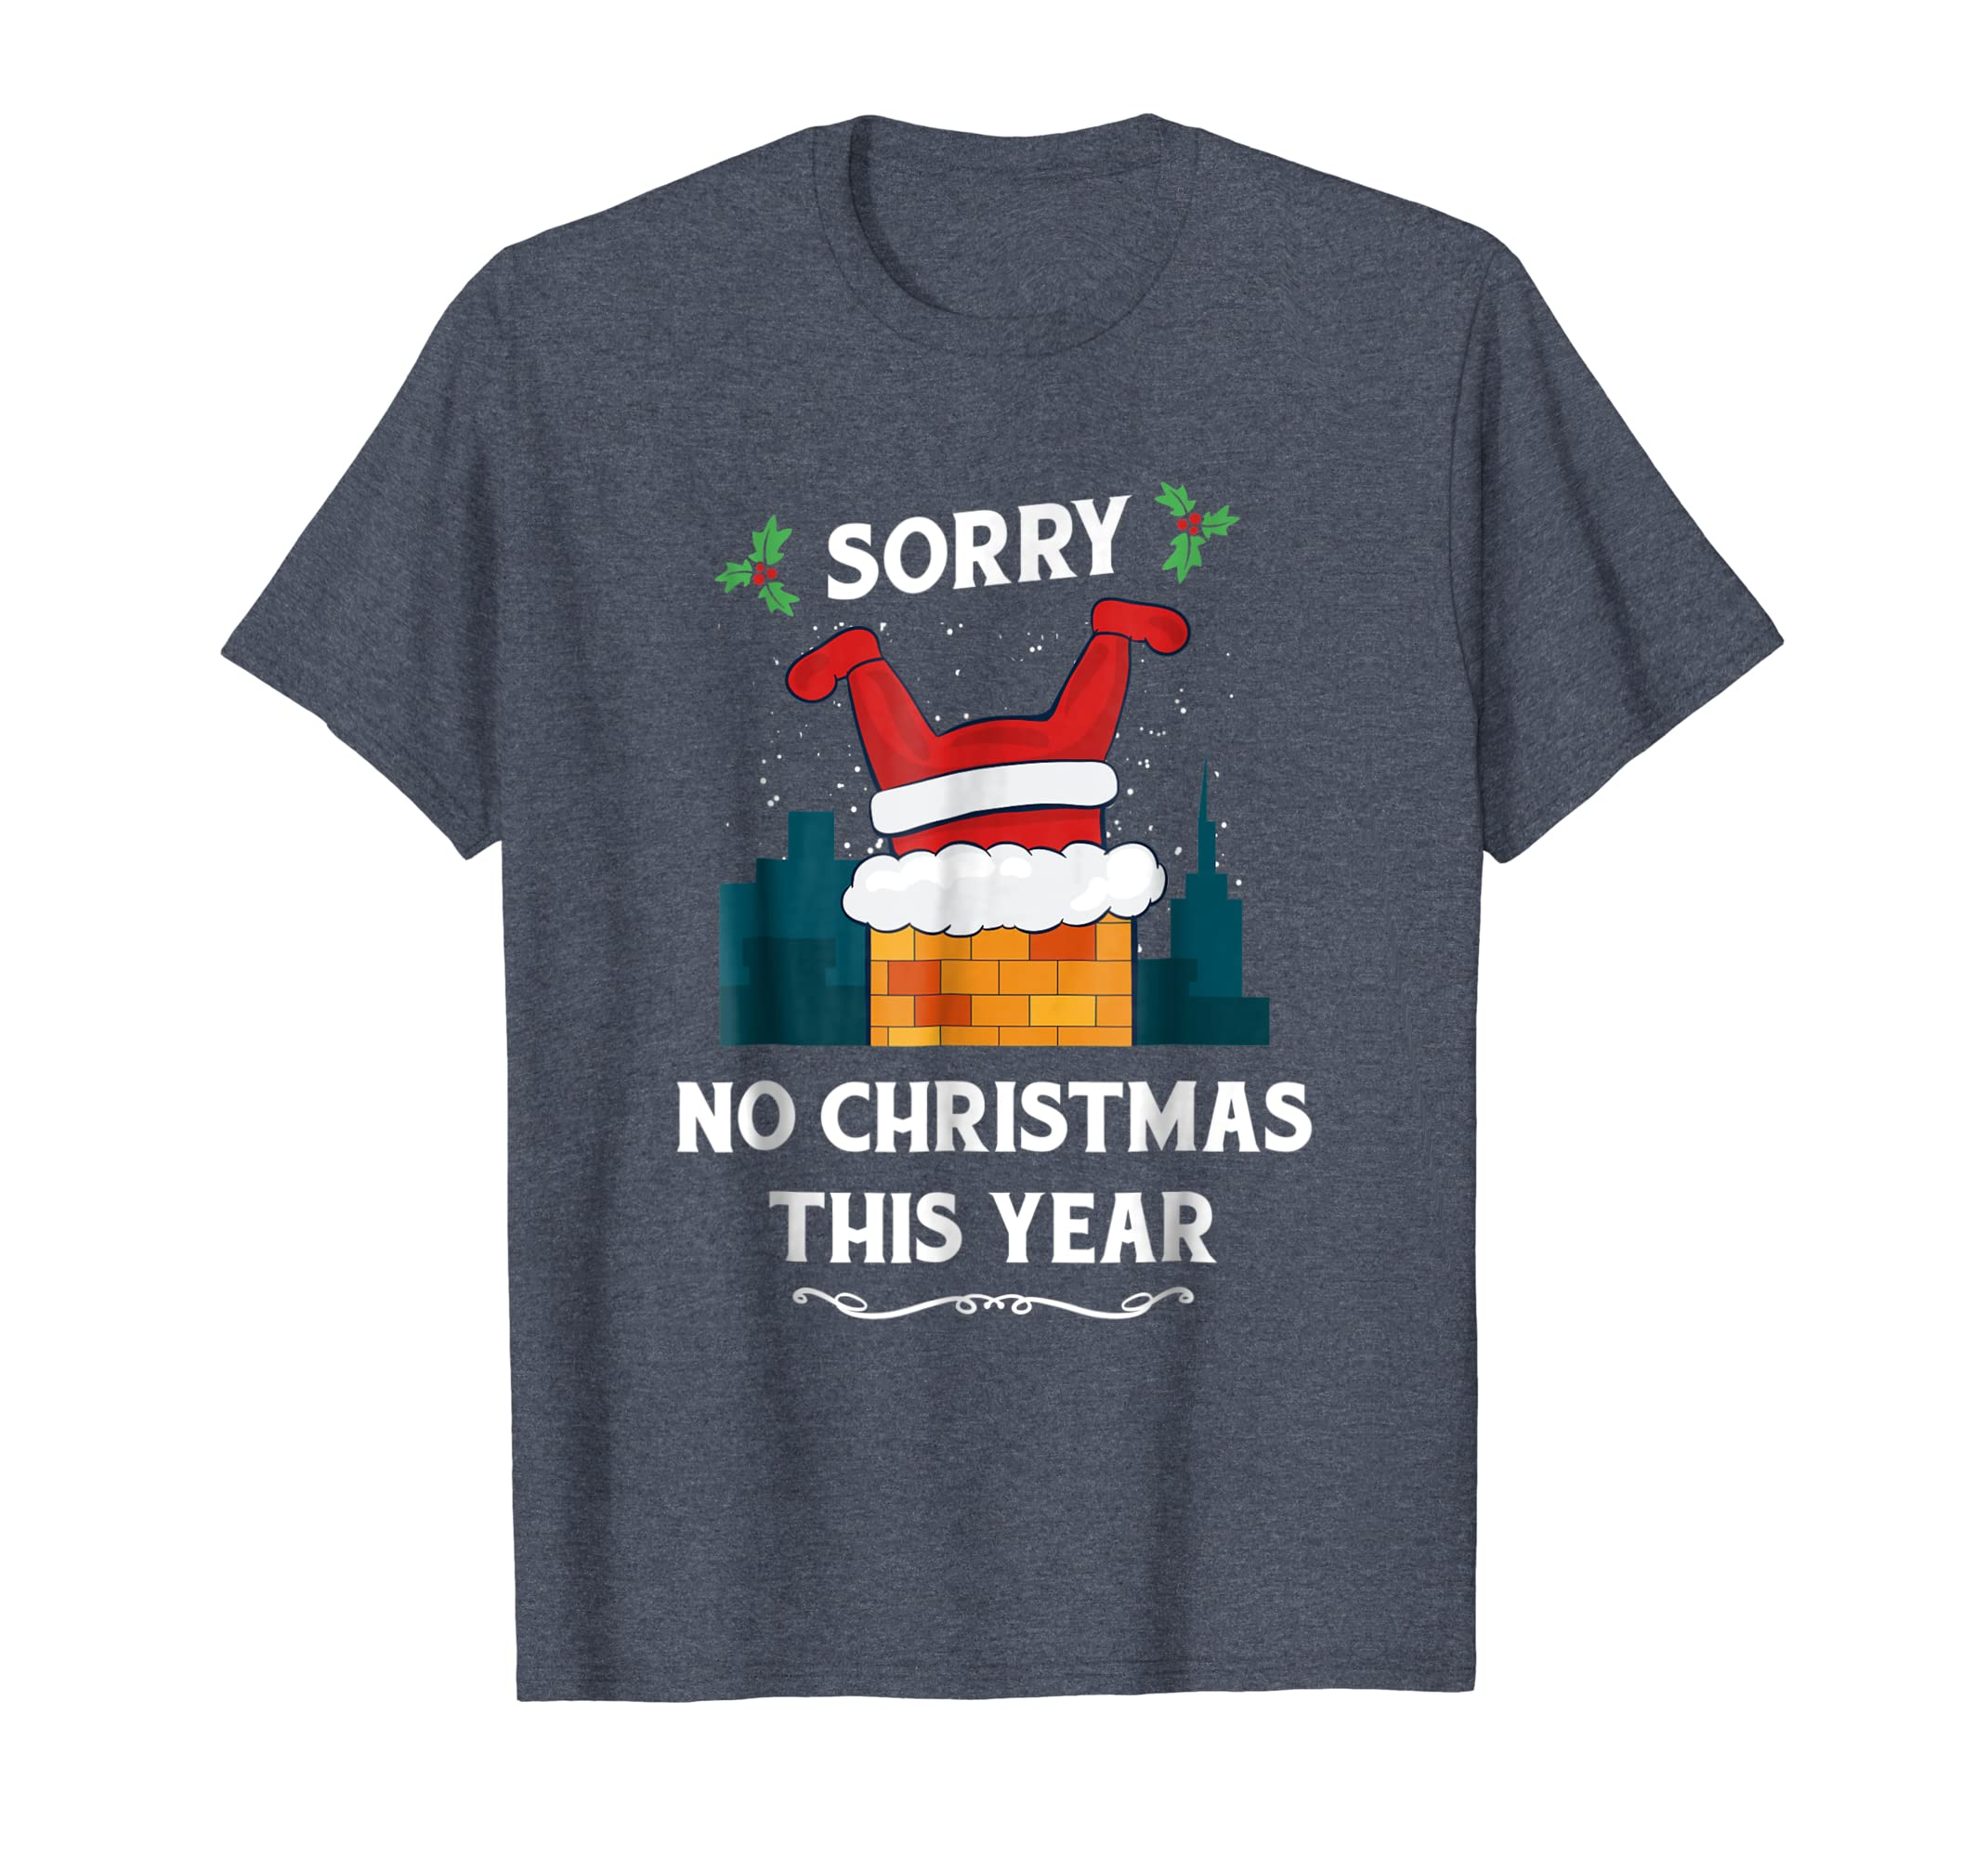 Amazon.com: Sorry No Christmas This Year Stuck Santa Claus T-Shirt ...